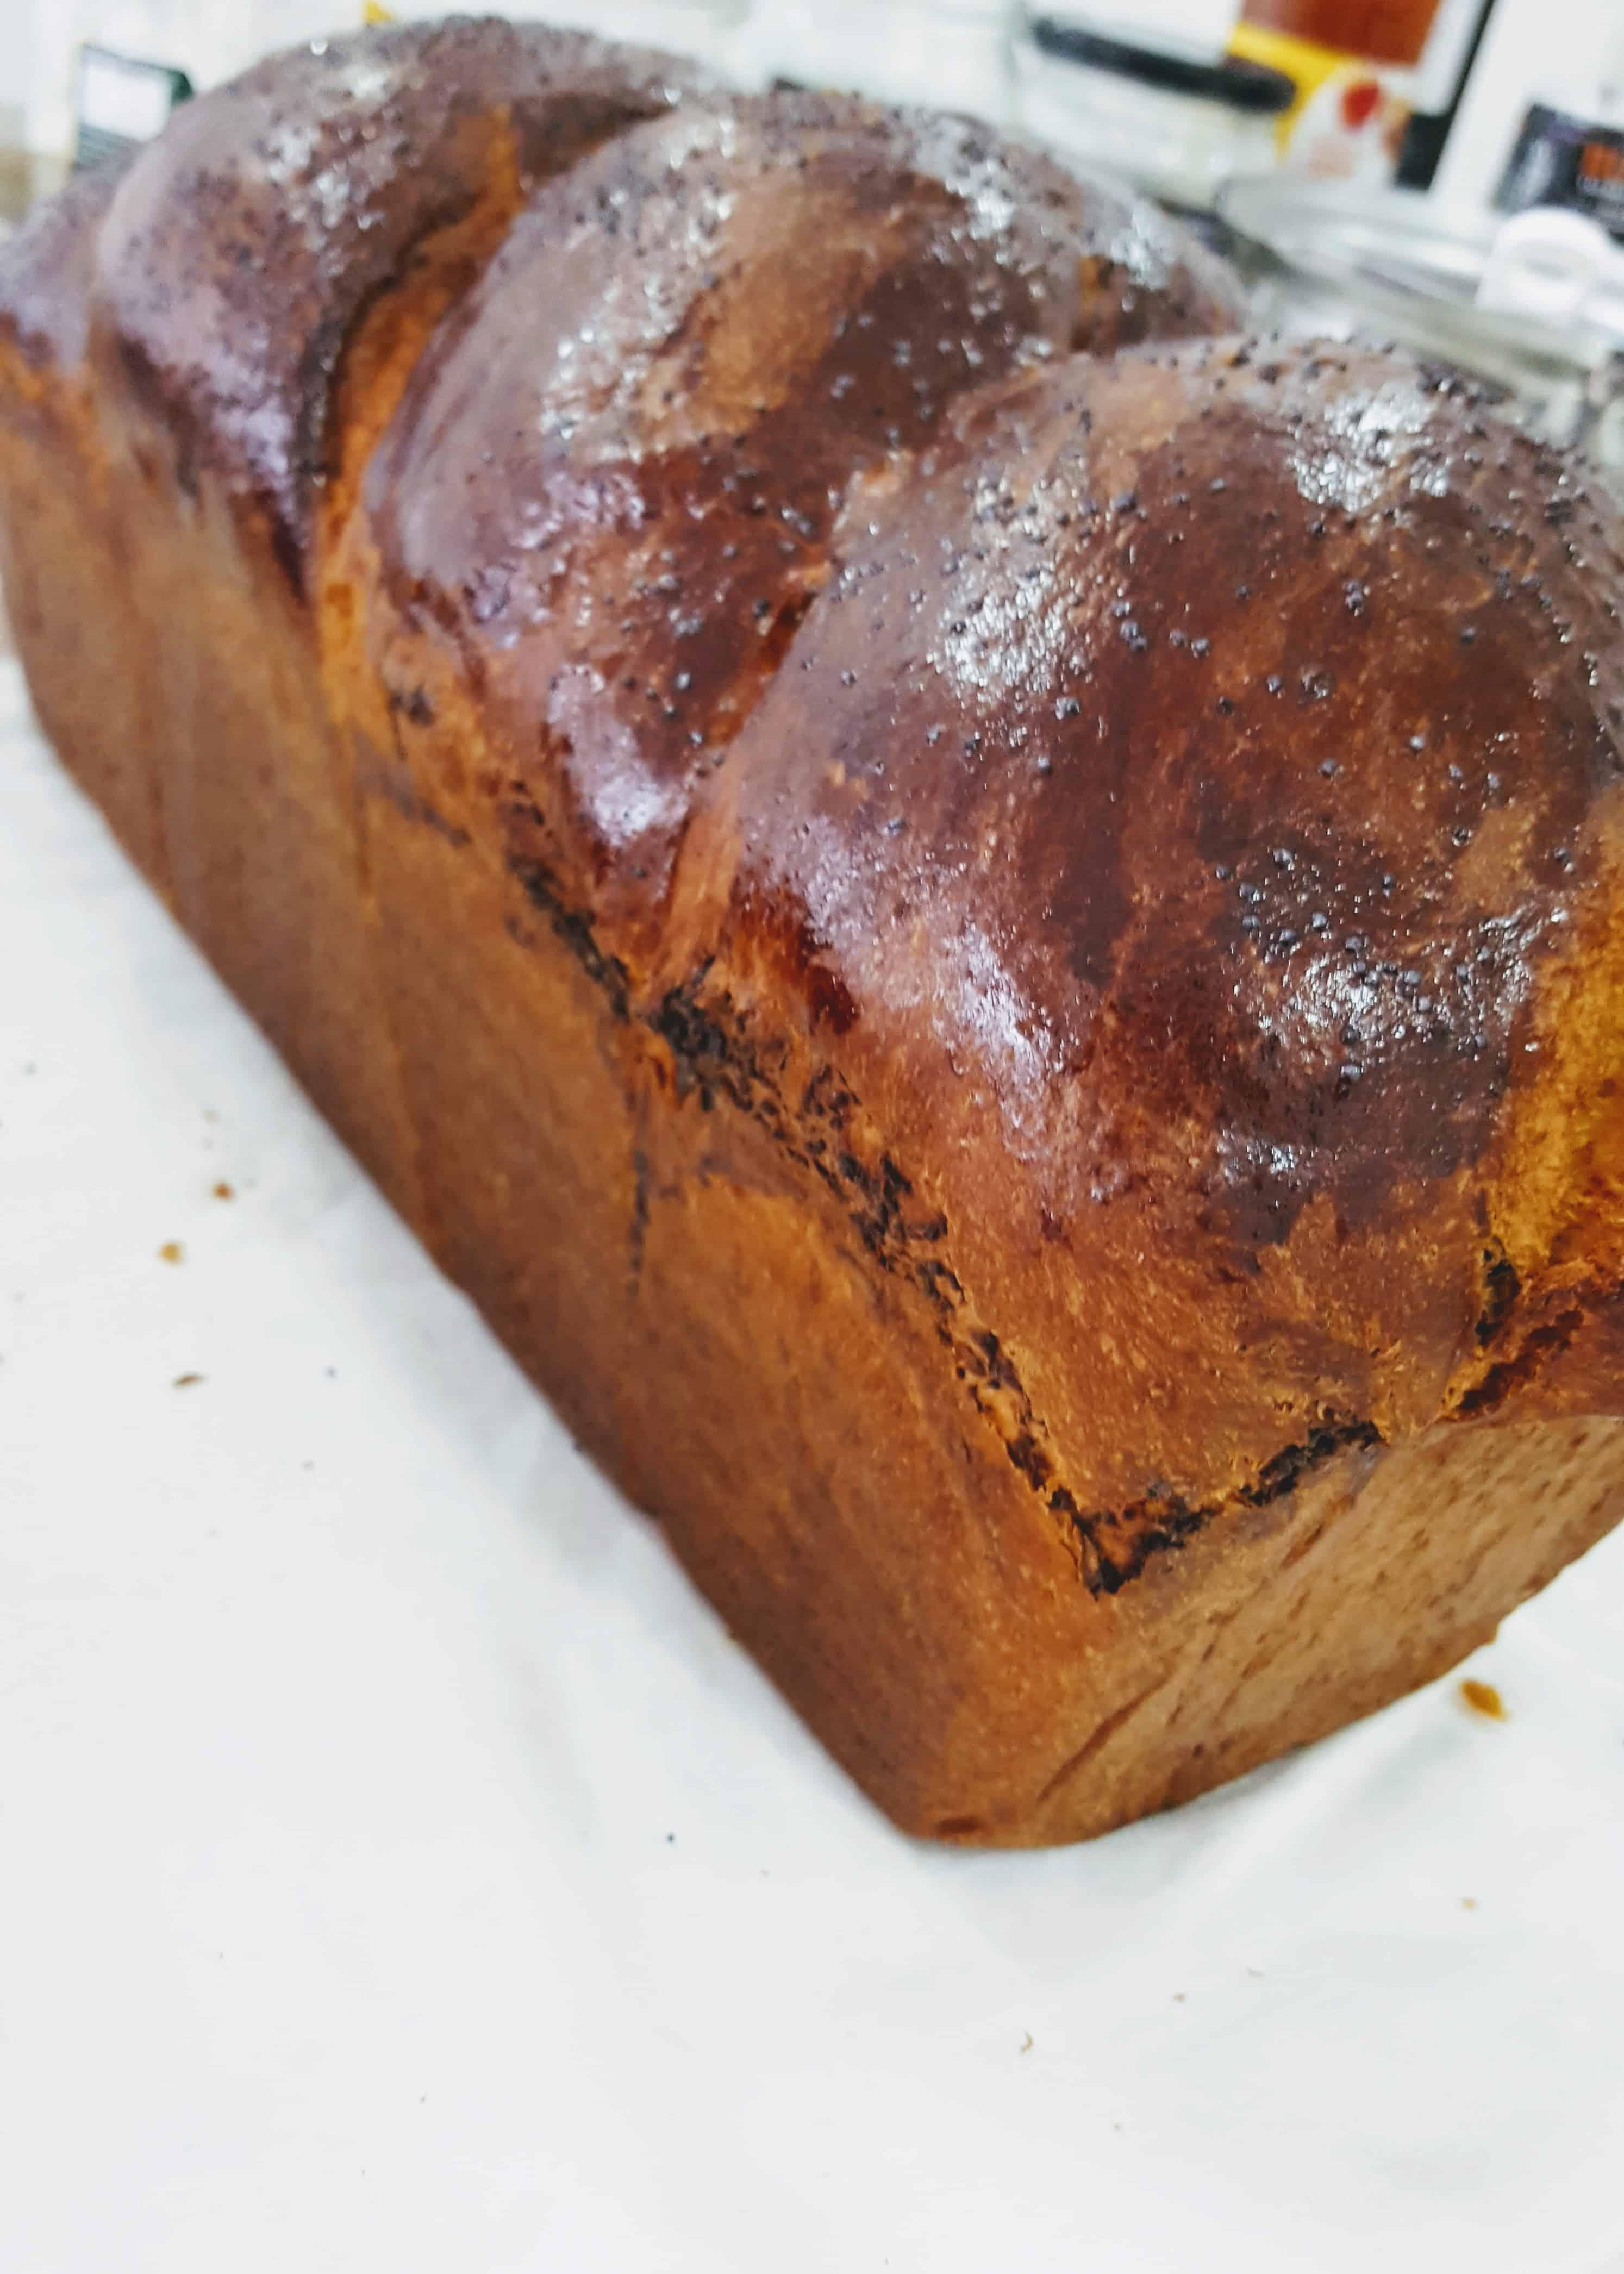 Cozonac de casa cu nuca - fara amelioratori/fara margarina - 1,6kg [4]